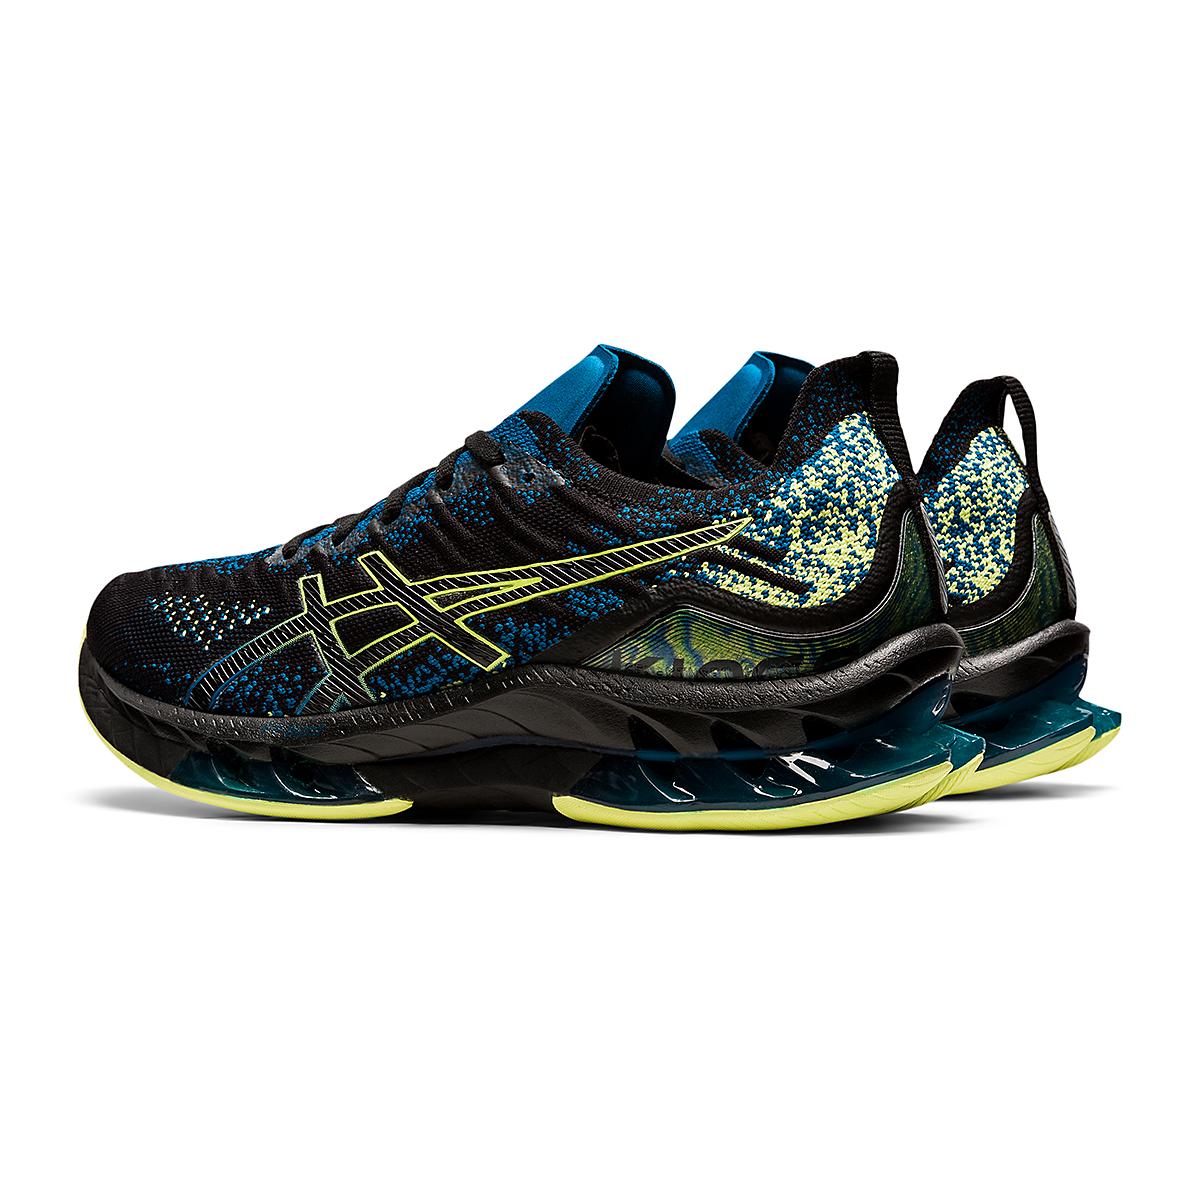 Men's Asics Kinsei Blast Running Shoe - Color: Black/Glow Yellow - Size: 6 - Width: Regular, Black/Glow Yellow, large, image 5